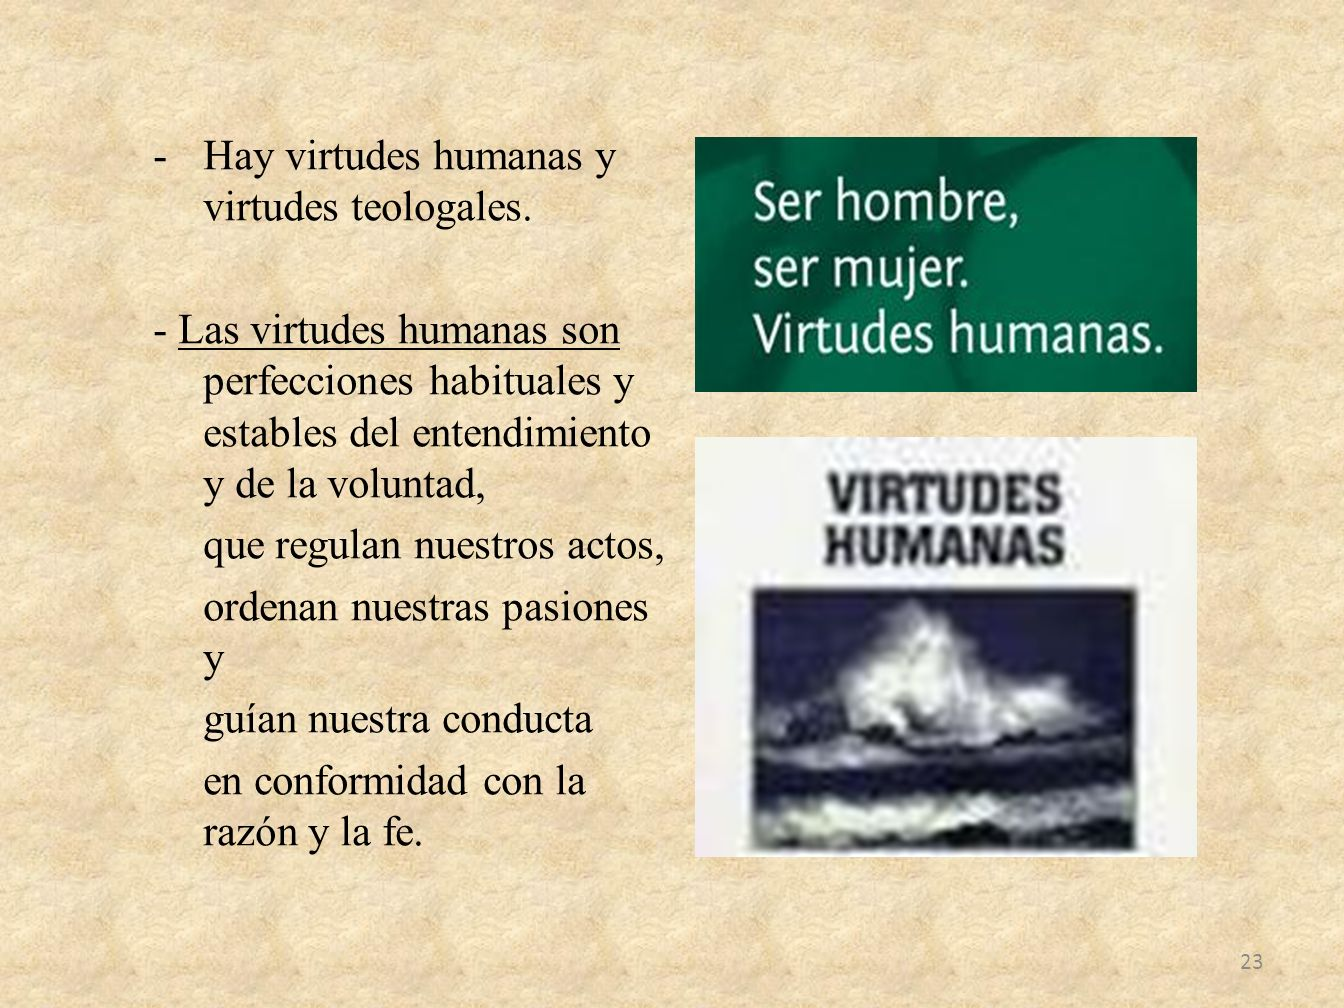 Hay virtudes humanas y virtudes teologales.